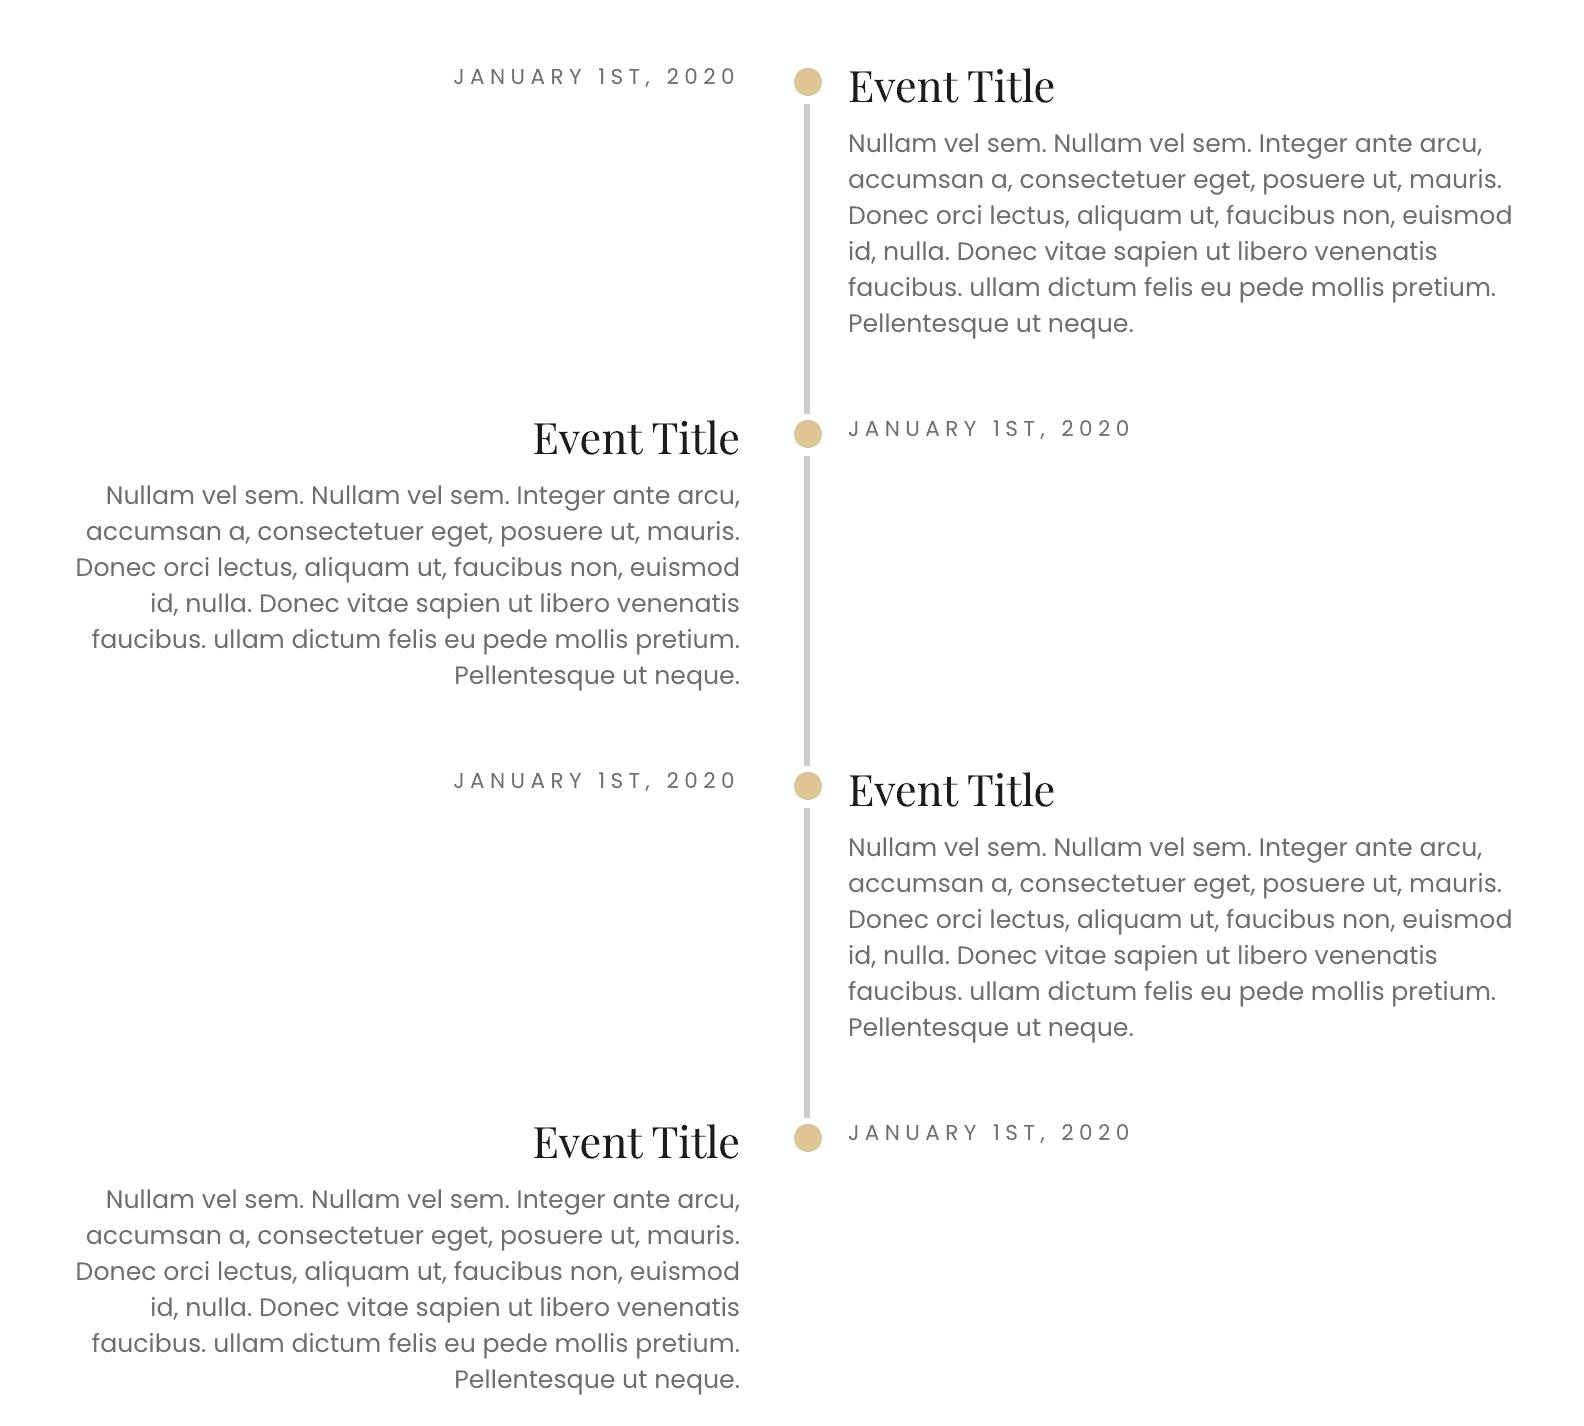 Dubsado-Code-Snippet-Timeline-Style-2